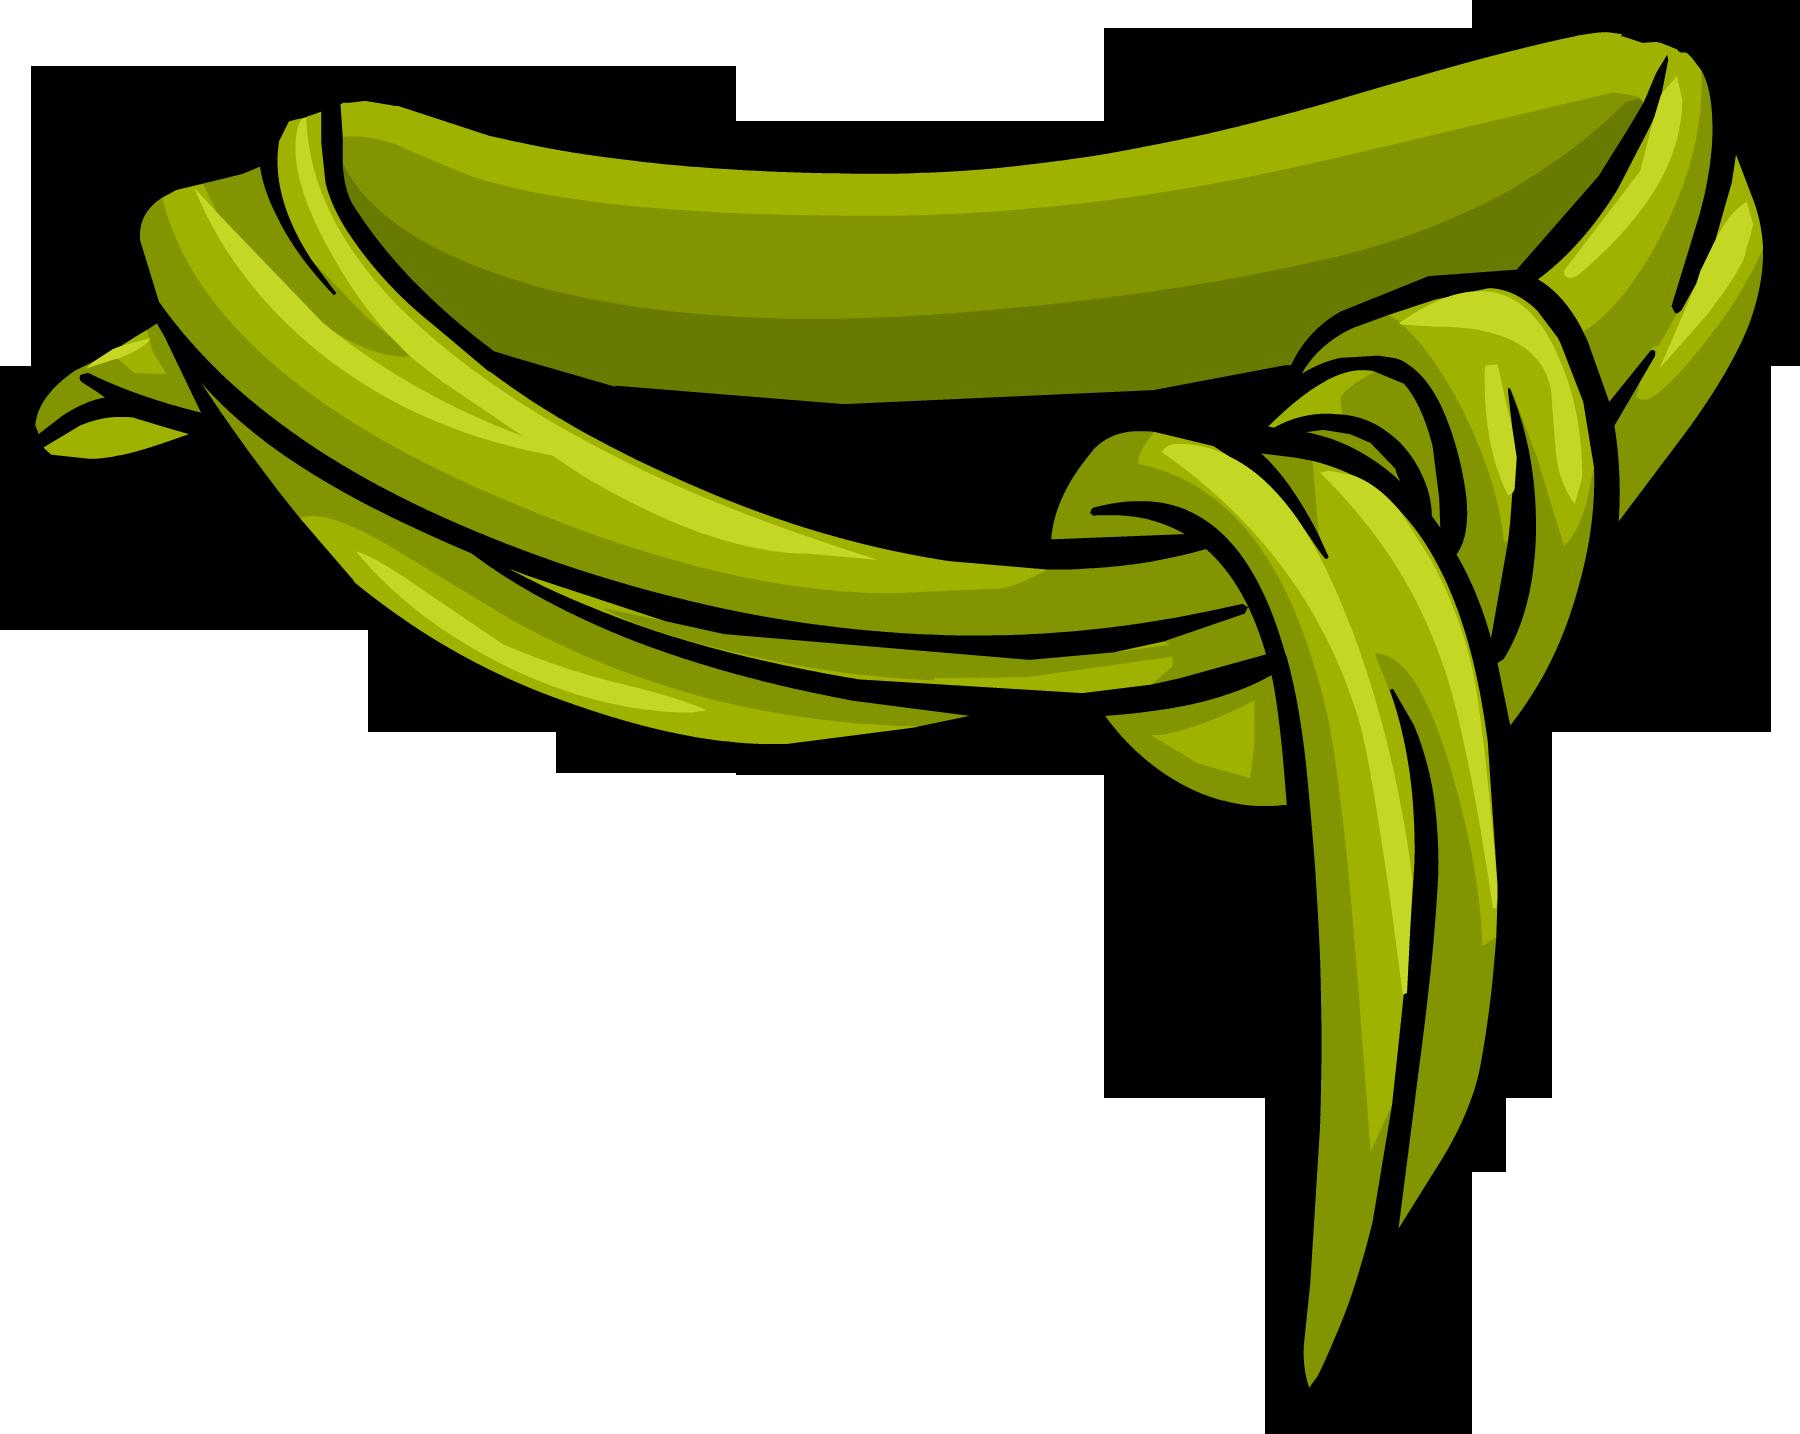 Cotton clipart coton. Green scarf club penguin